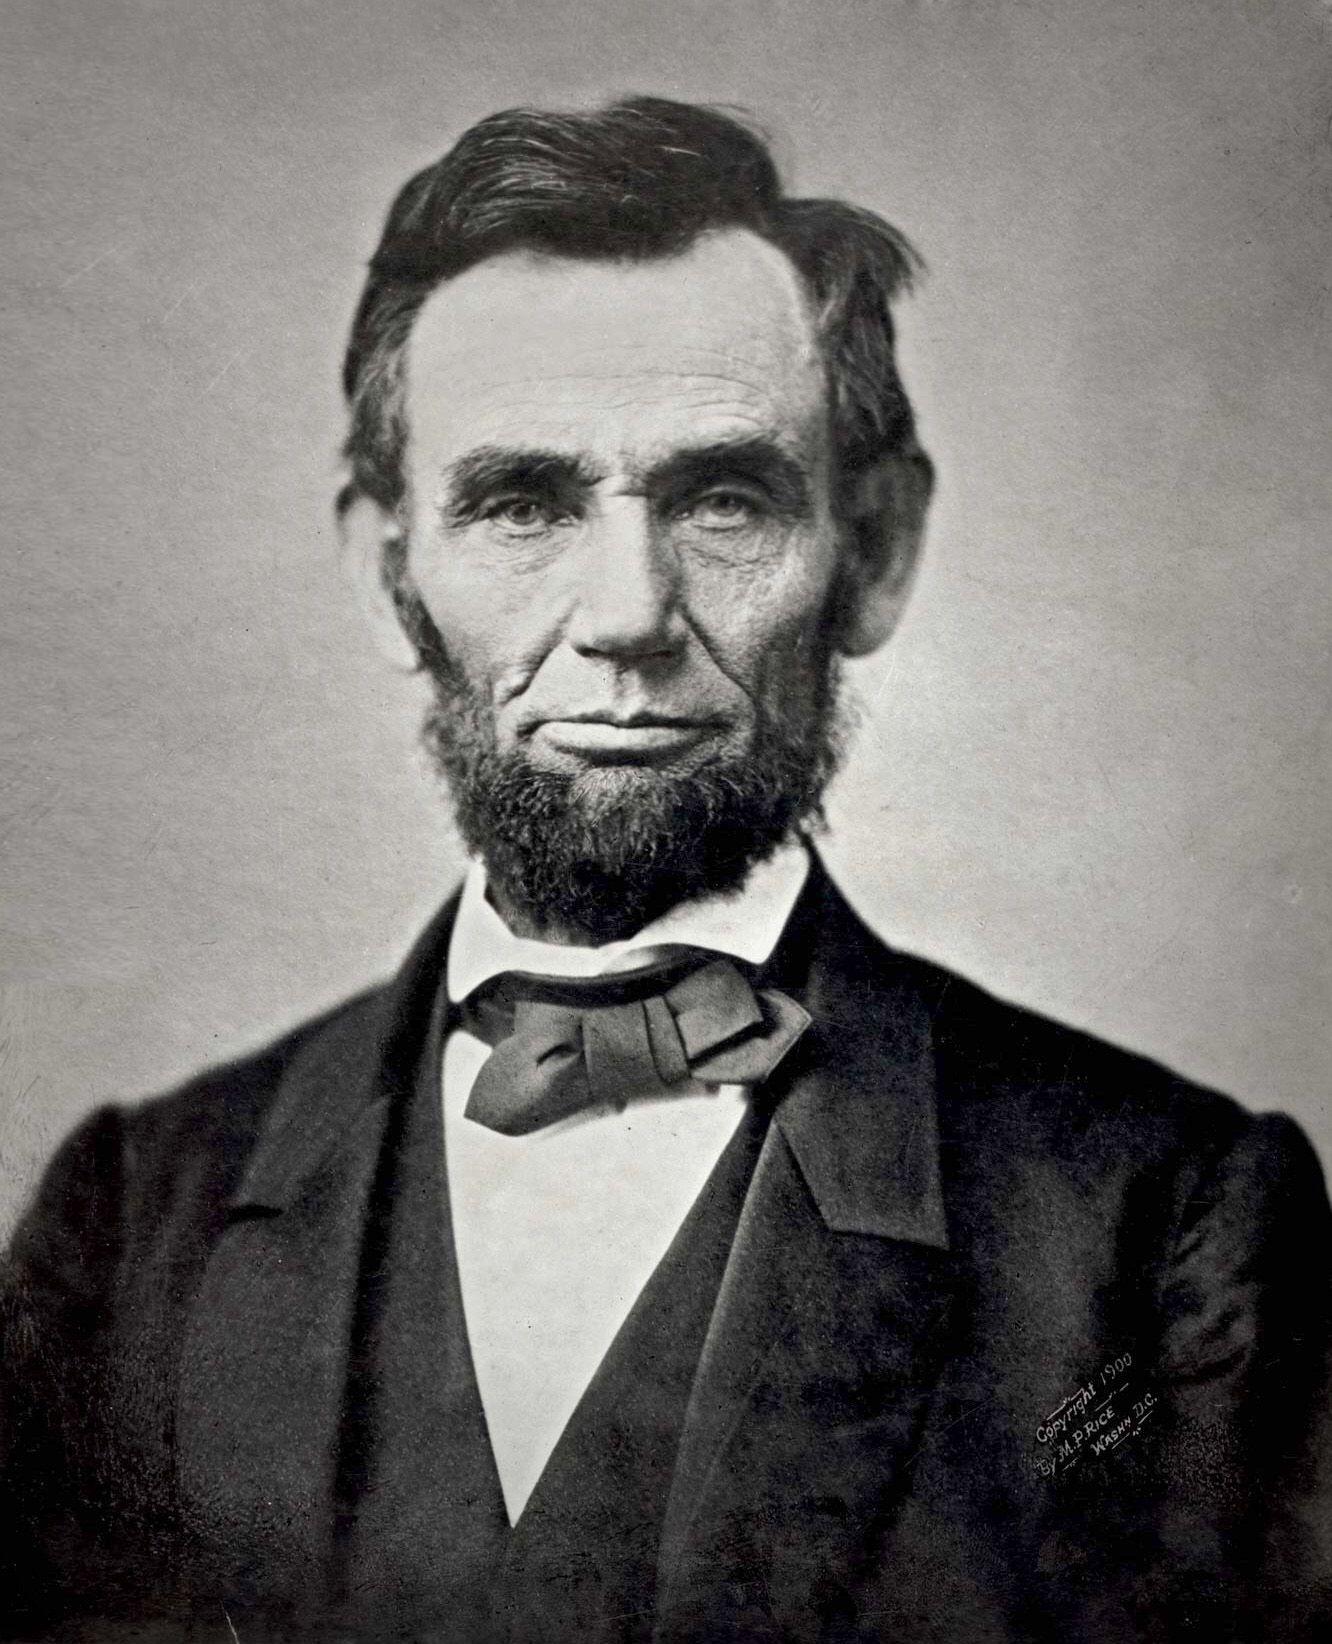 Abolish Slavery 1865 (Abraham Lincoln) Iconic Black And White Photograph